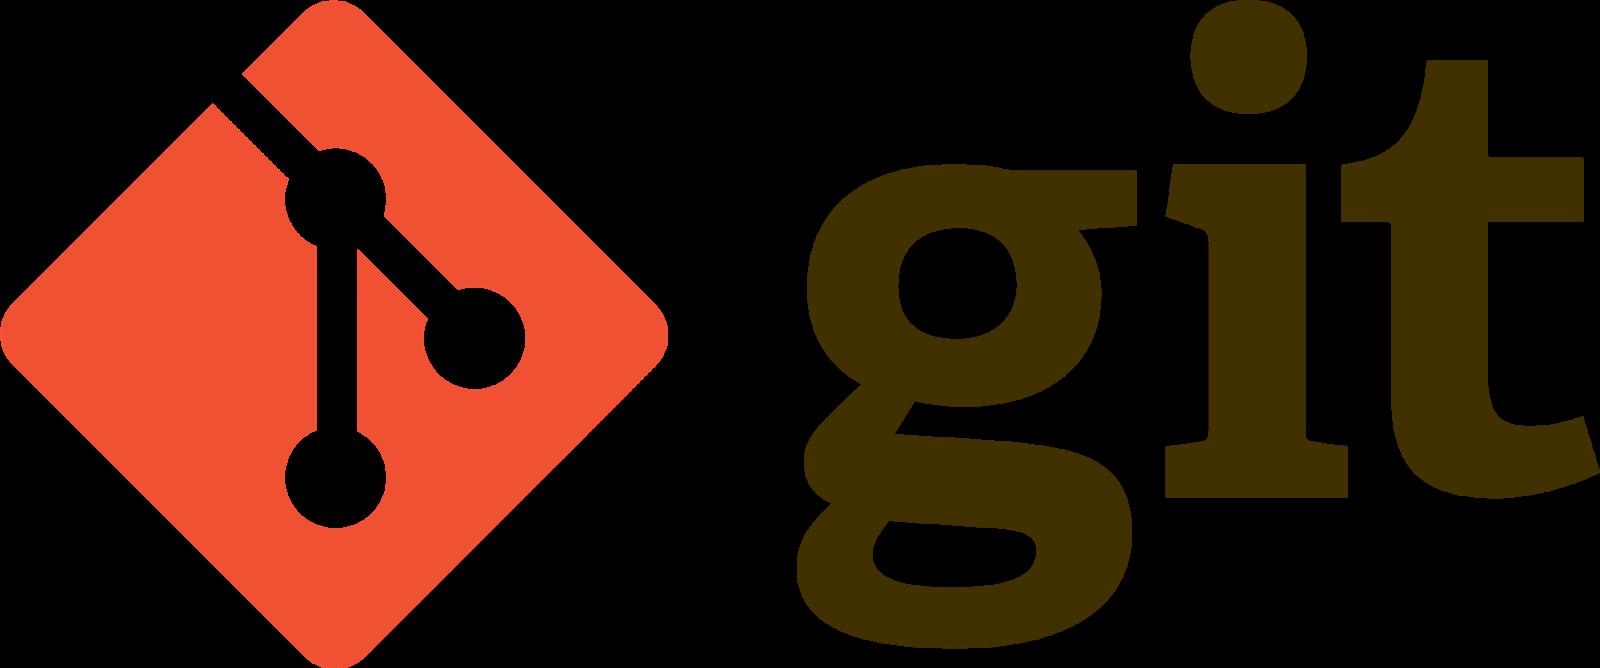 git hub